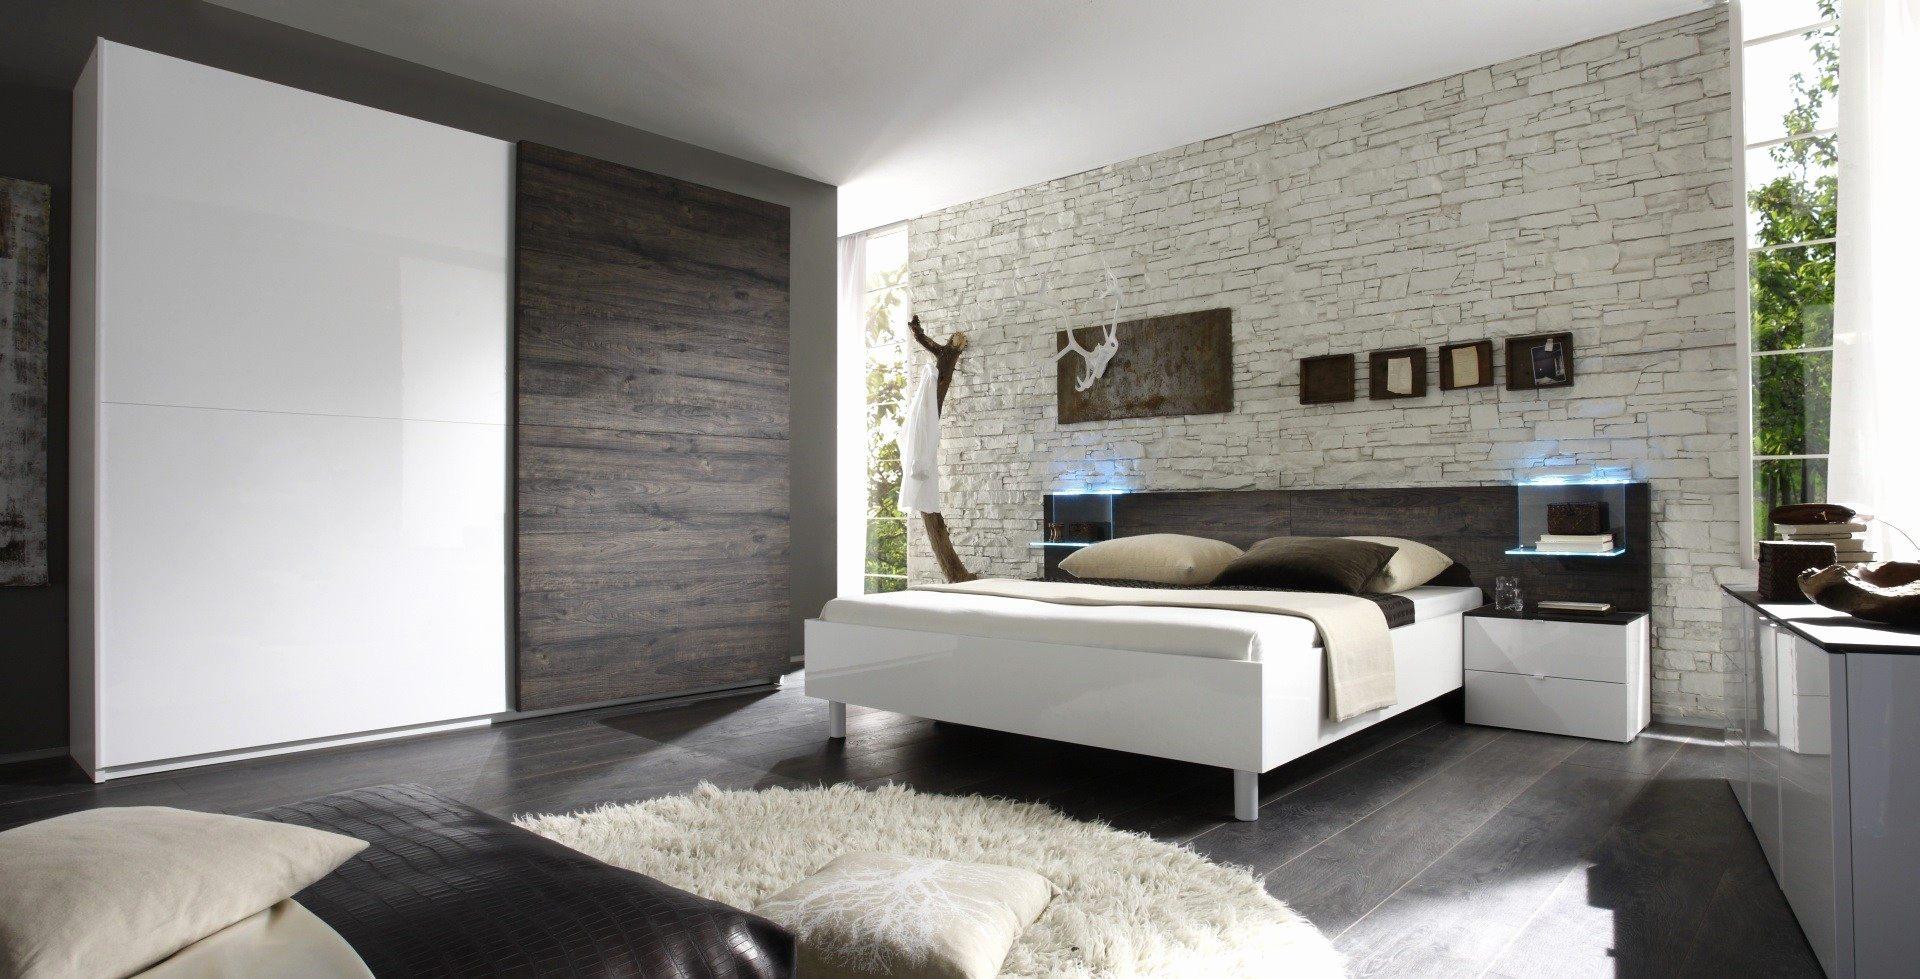 Tete De Lit Contemporaine Design Lit Moderne Design Inspirant Wilde